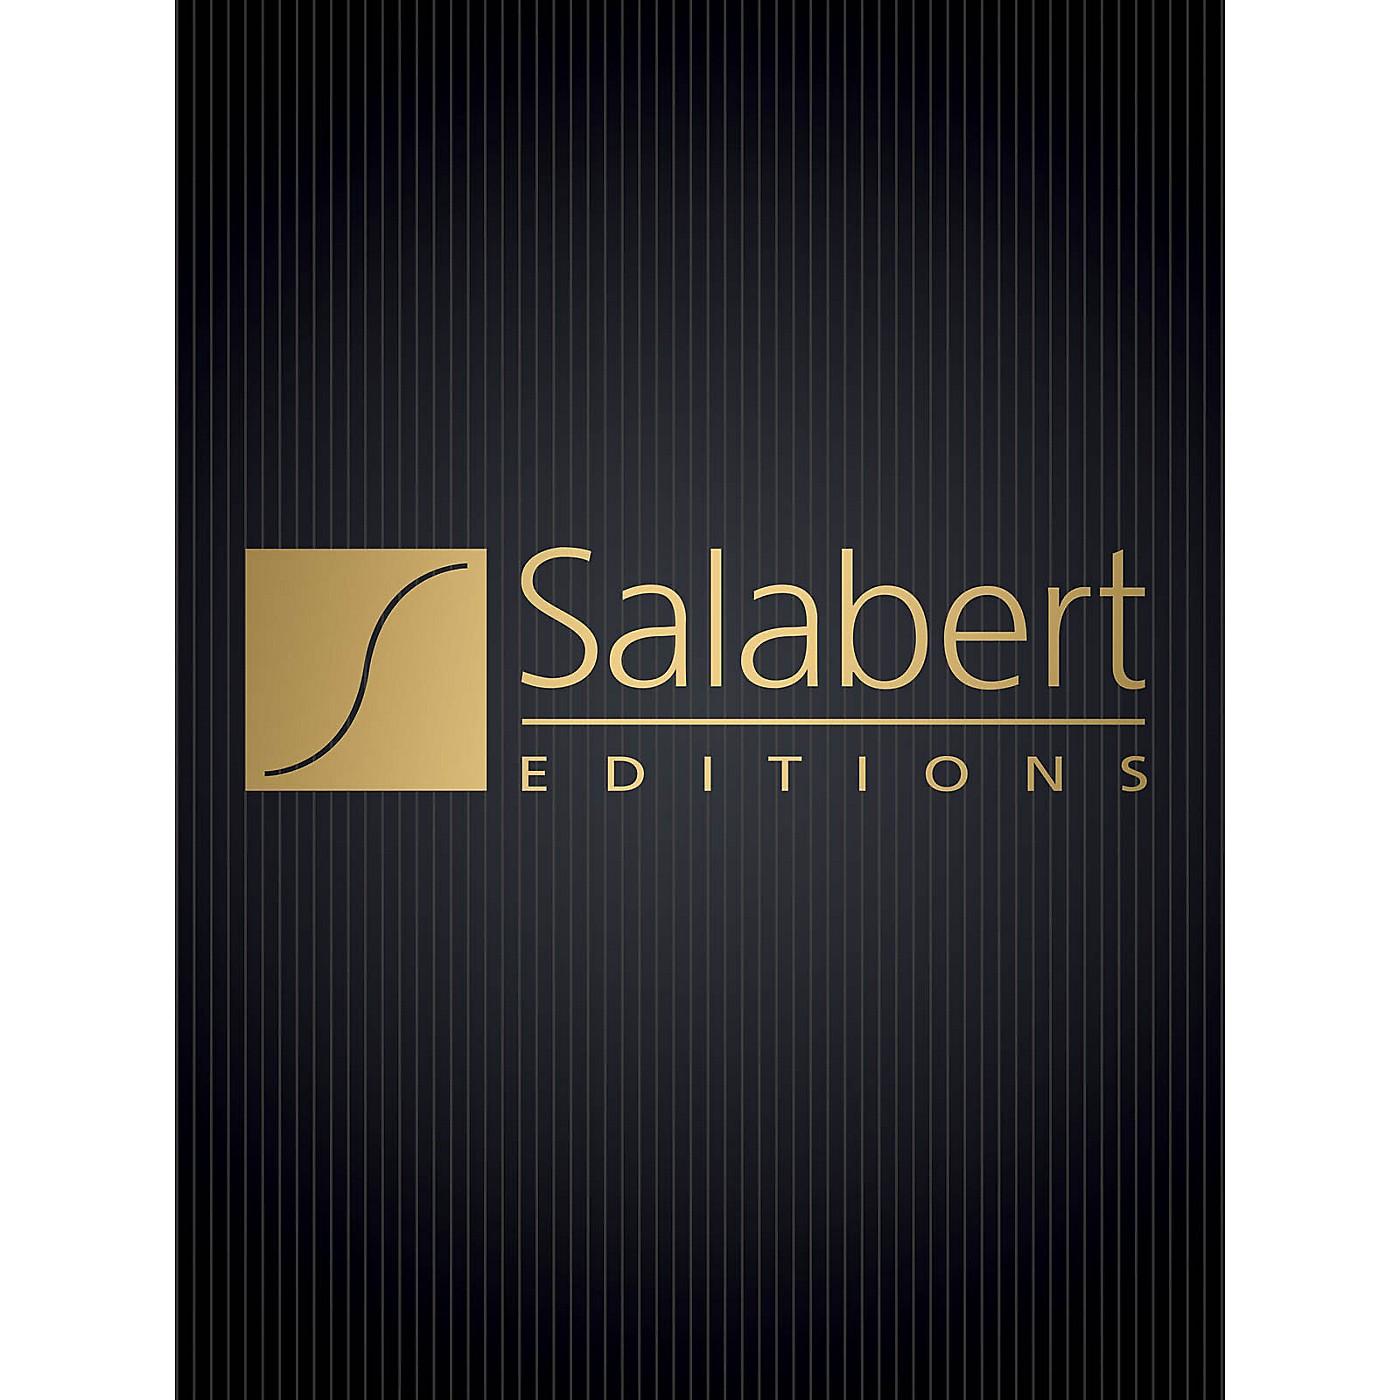 Salabert Au Joly Boys Unac Fr SATB Composed by De Sermisy thumbnail